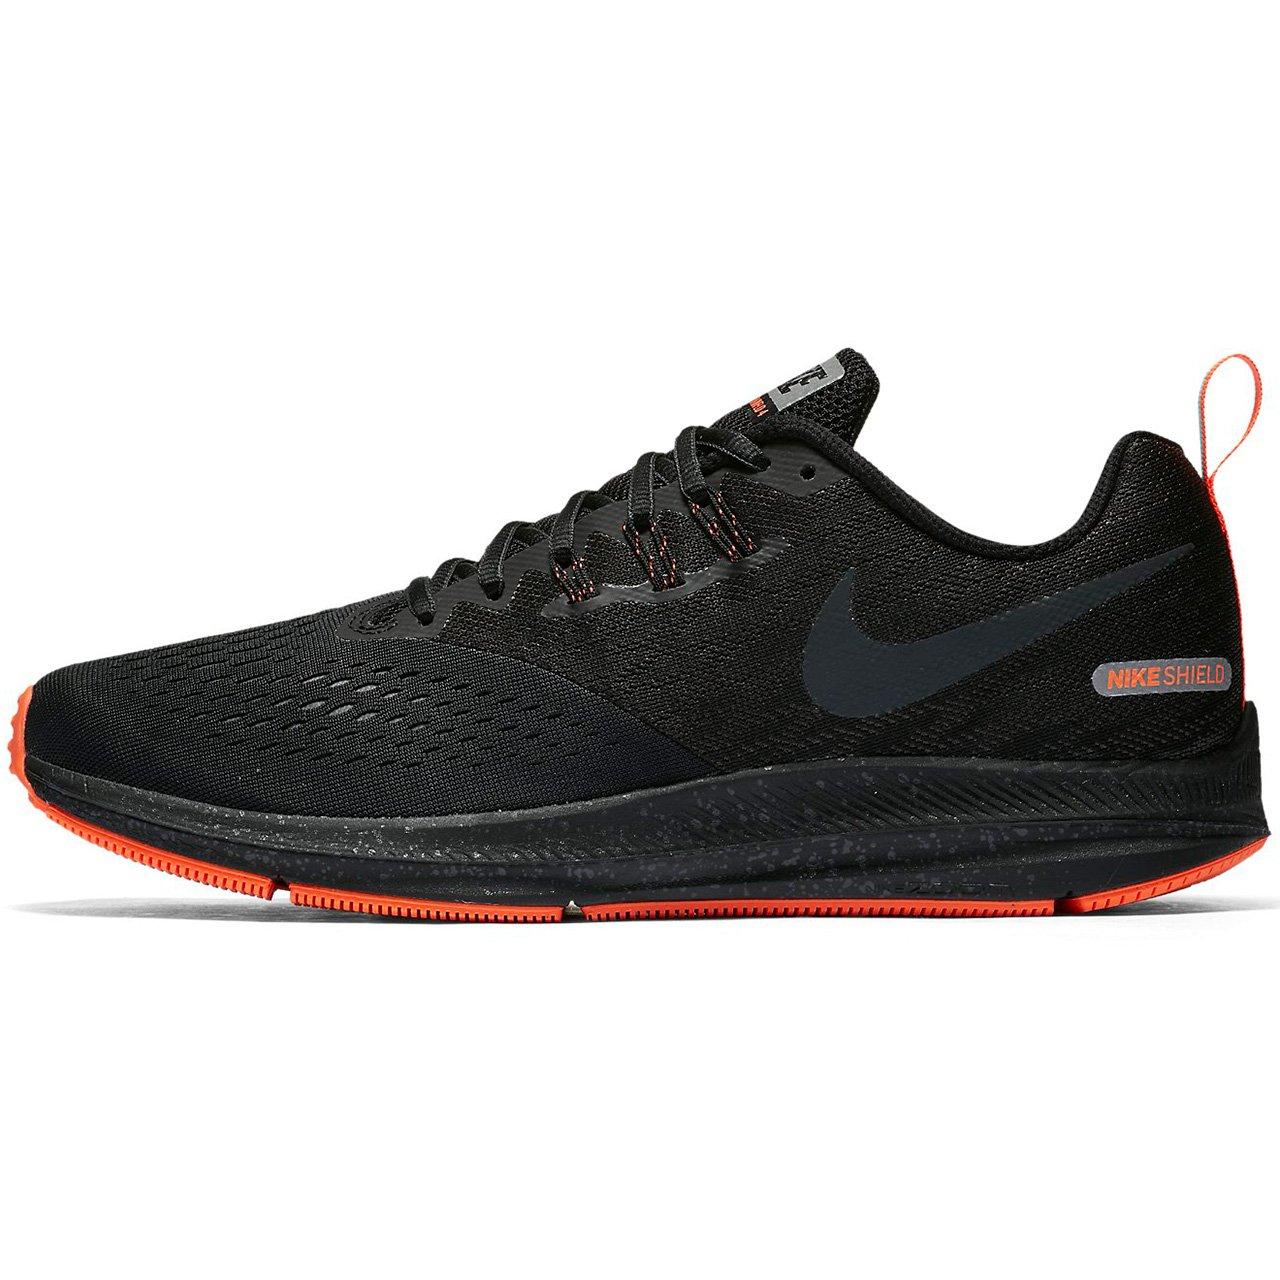 a7d5df9432732 Galleon - Nike Zoom Winflo 4 Shield Running Shoe